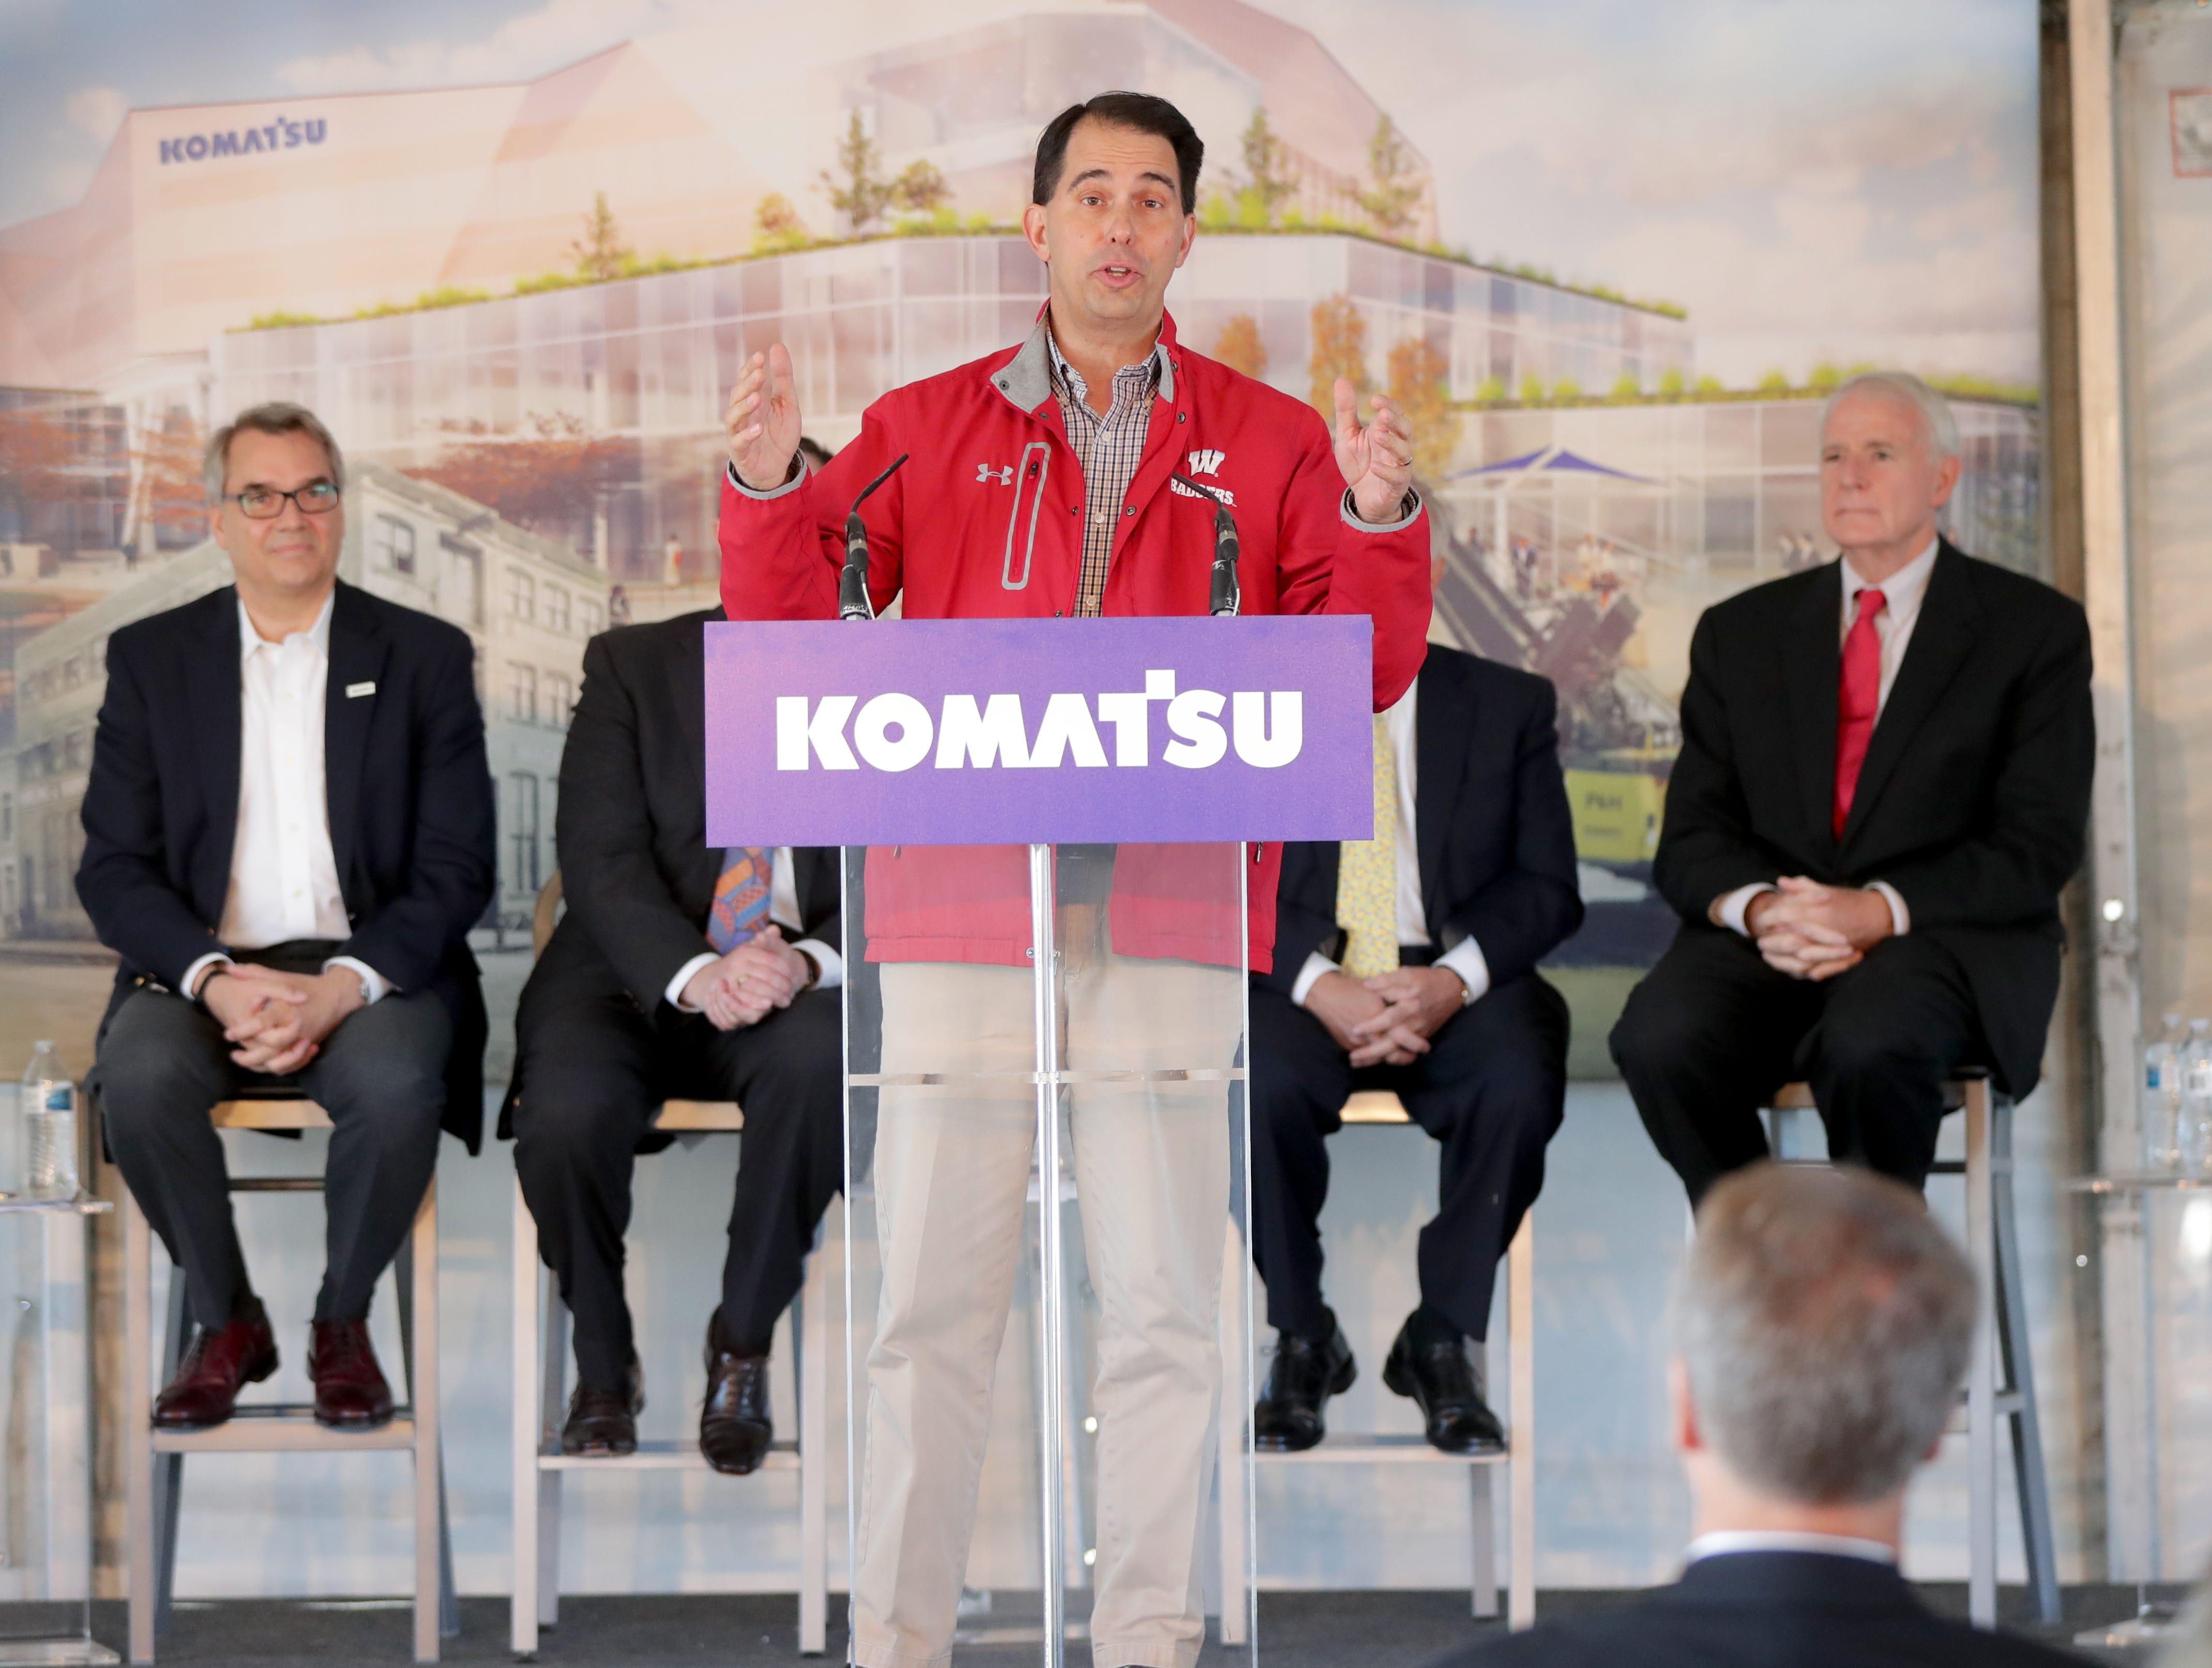 Gov. Scott Walker speaks as Jeff Dawes (left), president and CEO of Komatsu Mining Corp., and Mayor Tom Barrett (right) listen as Komatsu Mining Corp. announced details Thursday of a new development in Milwaukee's Harbor District.